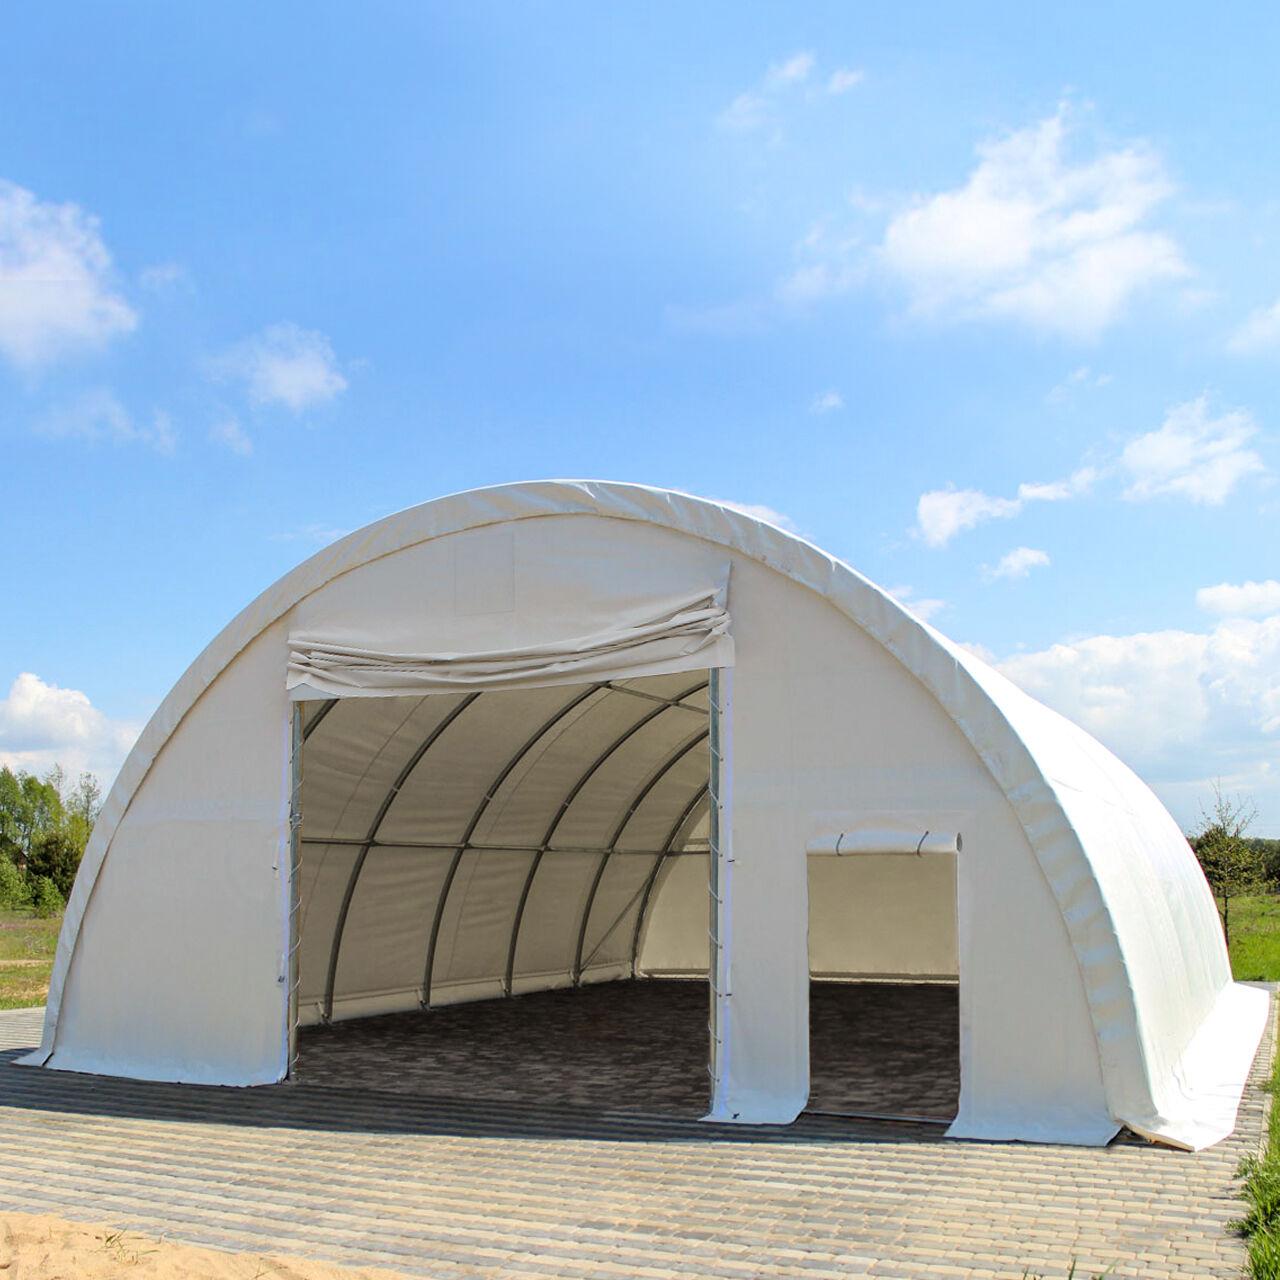 Intent24.fr Tunnel de stockage 9,15x10m PVC 720 g/m2 blanc imperméable tunnel agricole